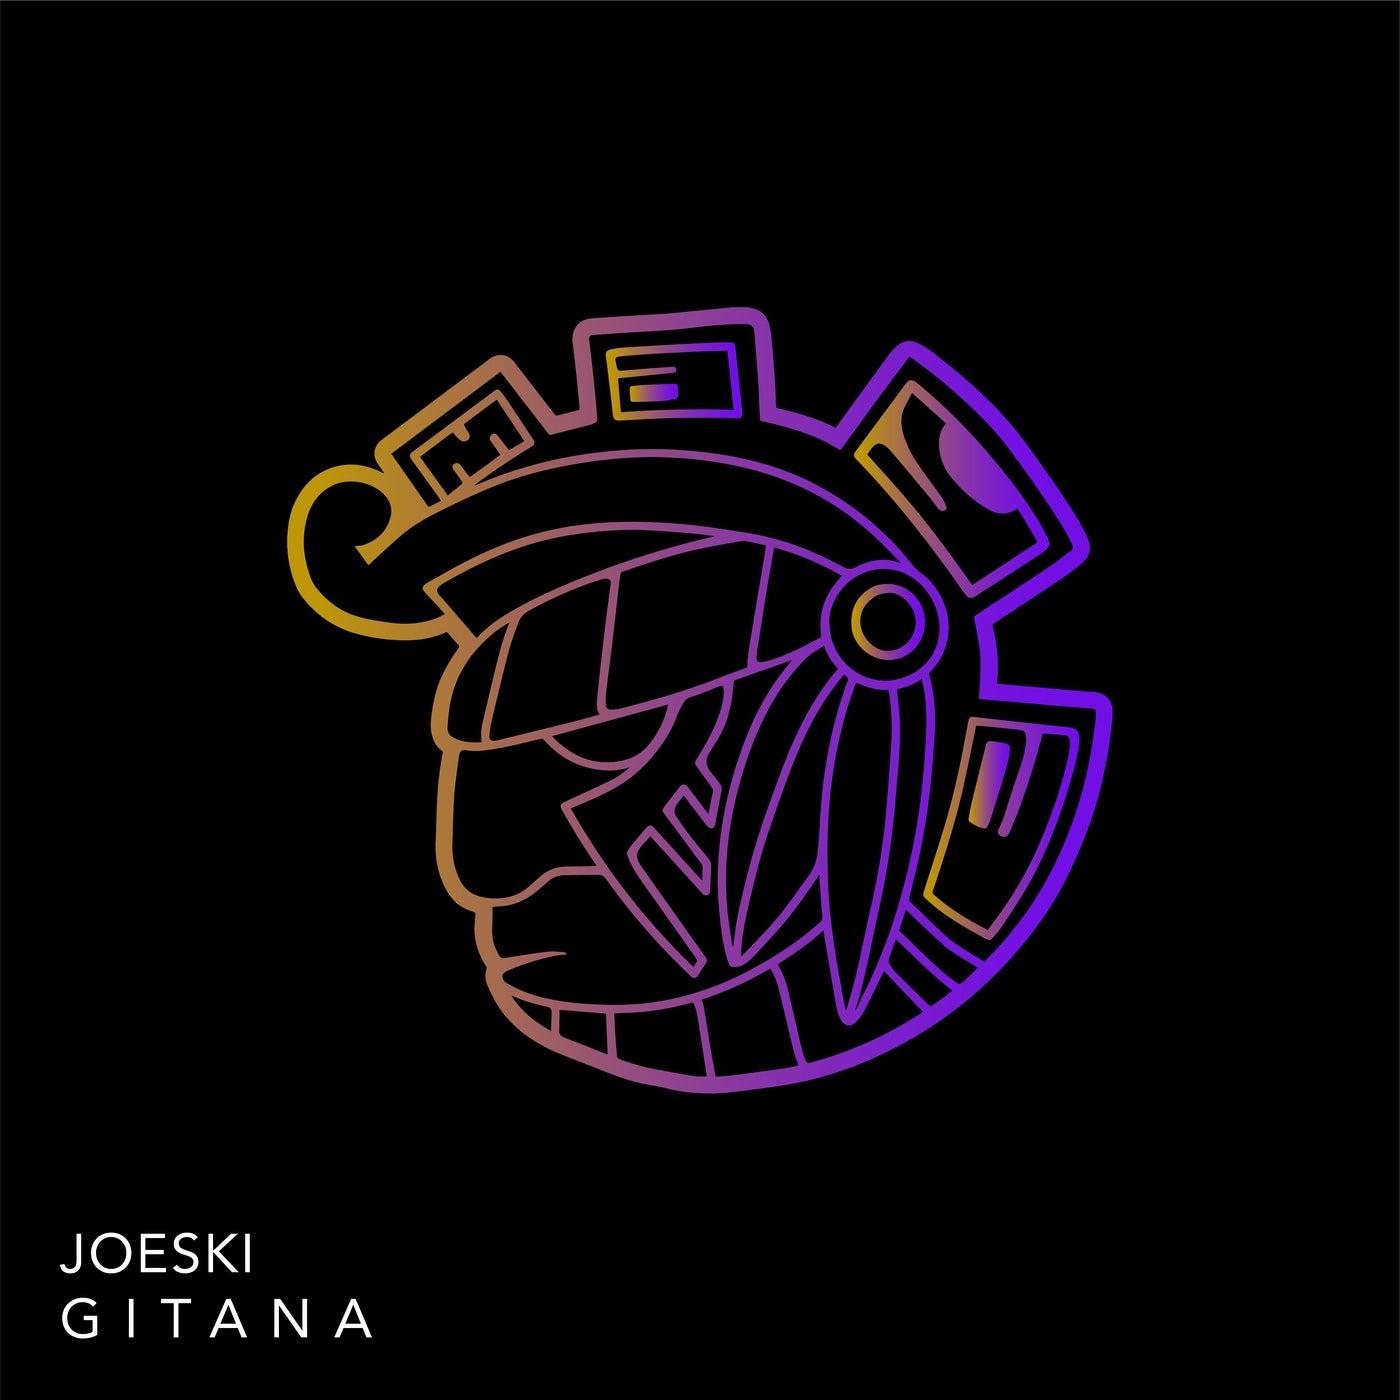 Gitana (Original Mix)